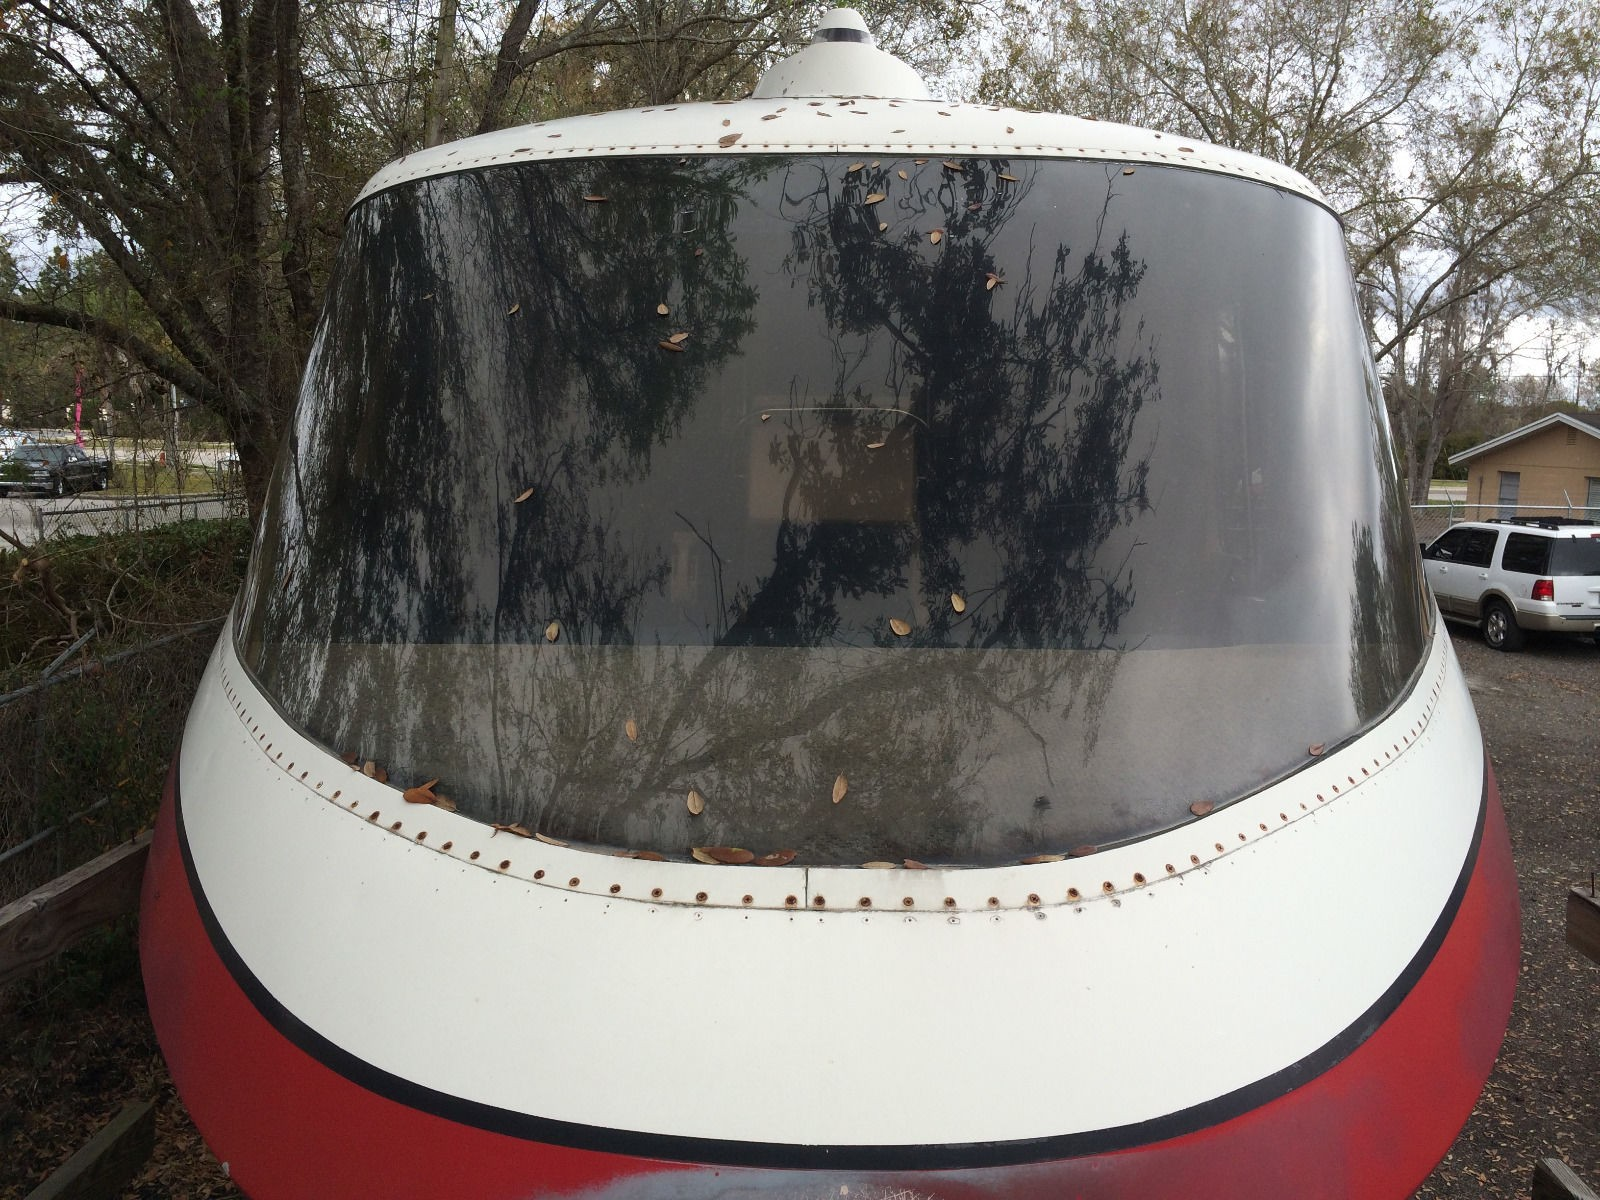 Walt Disney World Monorail Car For Sale On Ebay Blogs